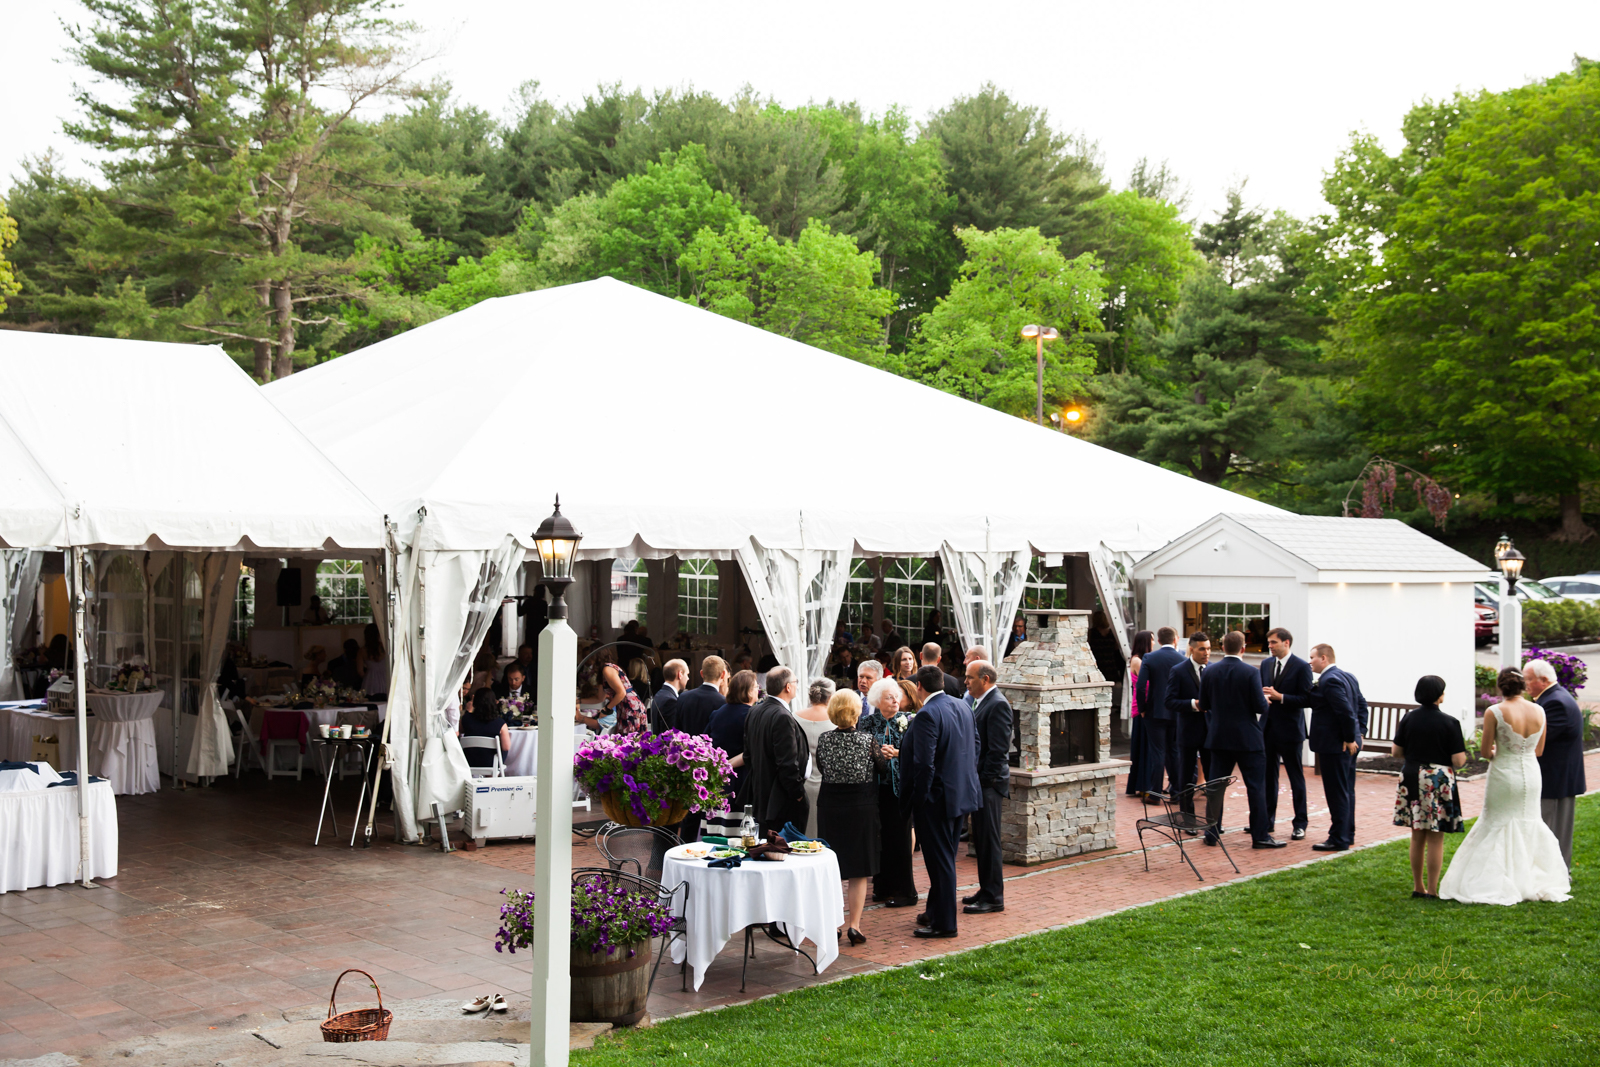 Publick-House-Wedding-Amanda-Morgan-62.jpg